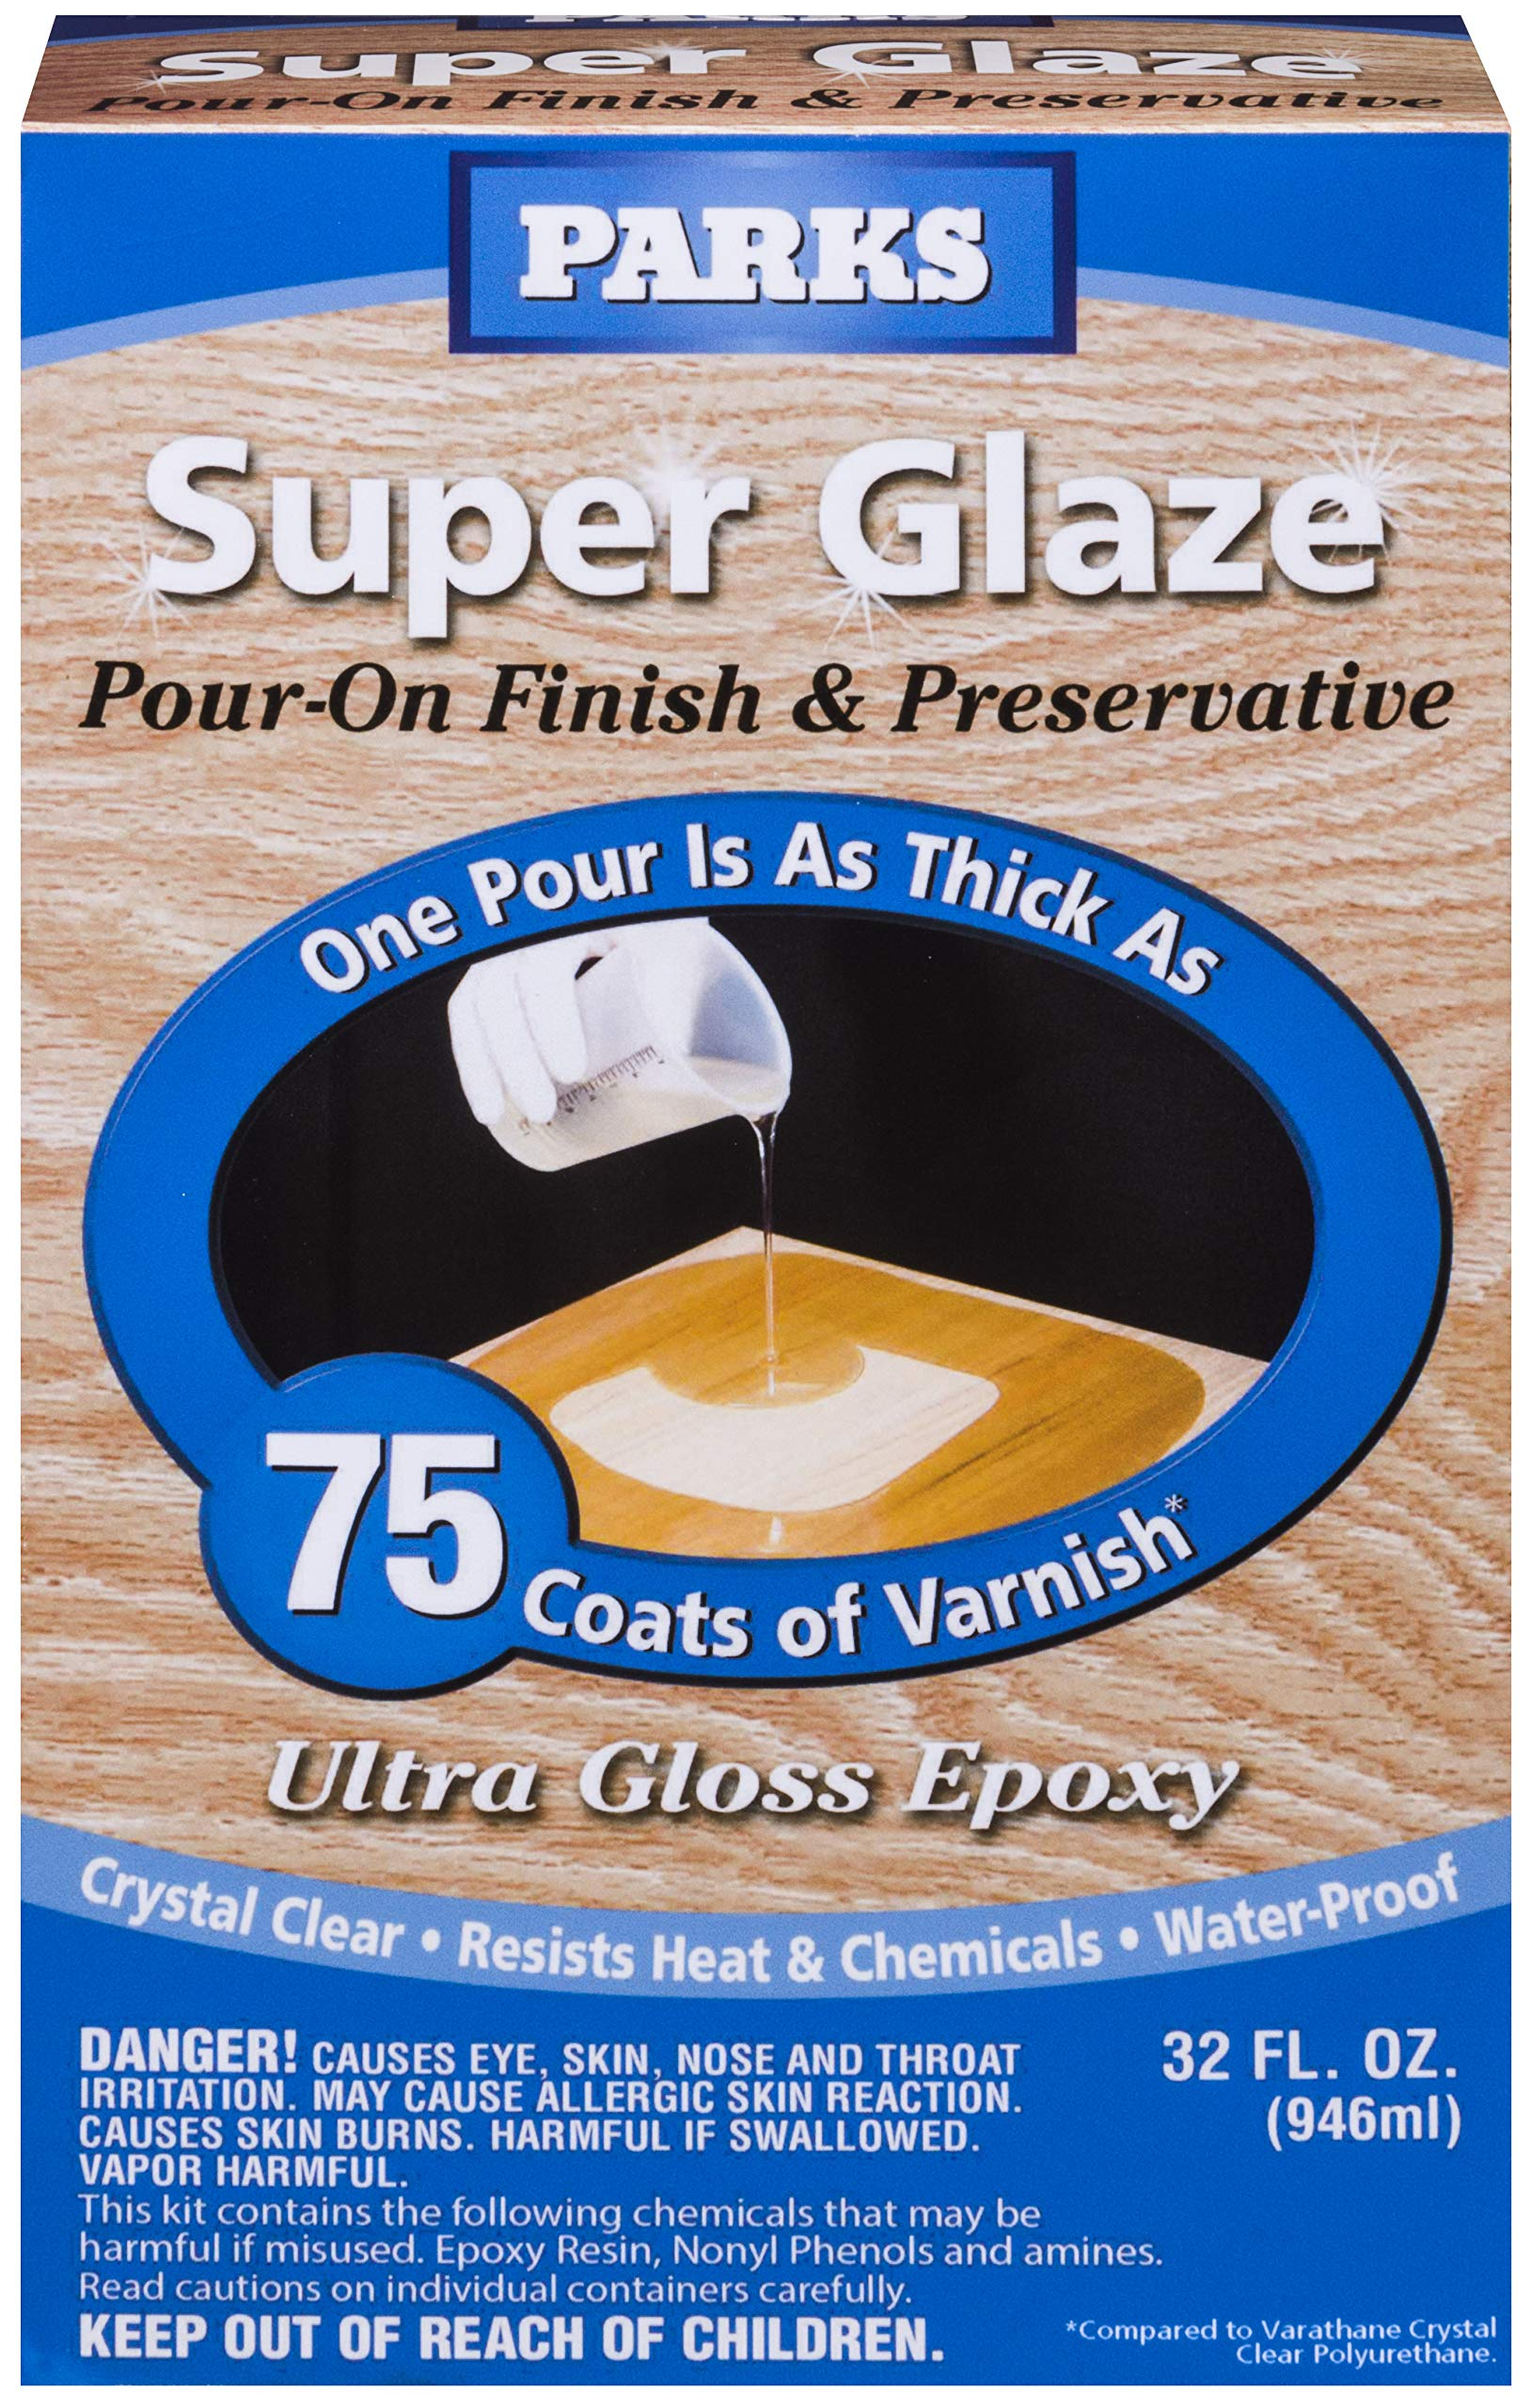 Rust-Oleum Parks Super Glaze, 241352 Ultra Glossy Epoxy Finish and Preservative Kit, Clear 32 Fl Oz by Rust-Oleum